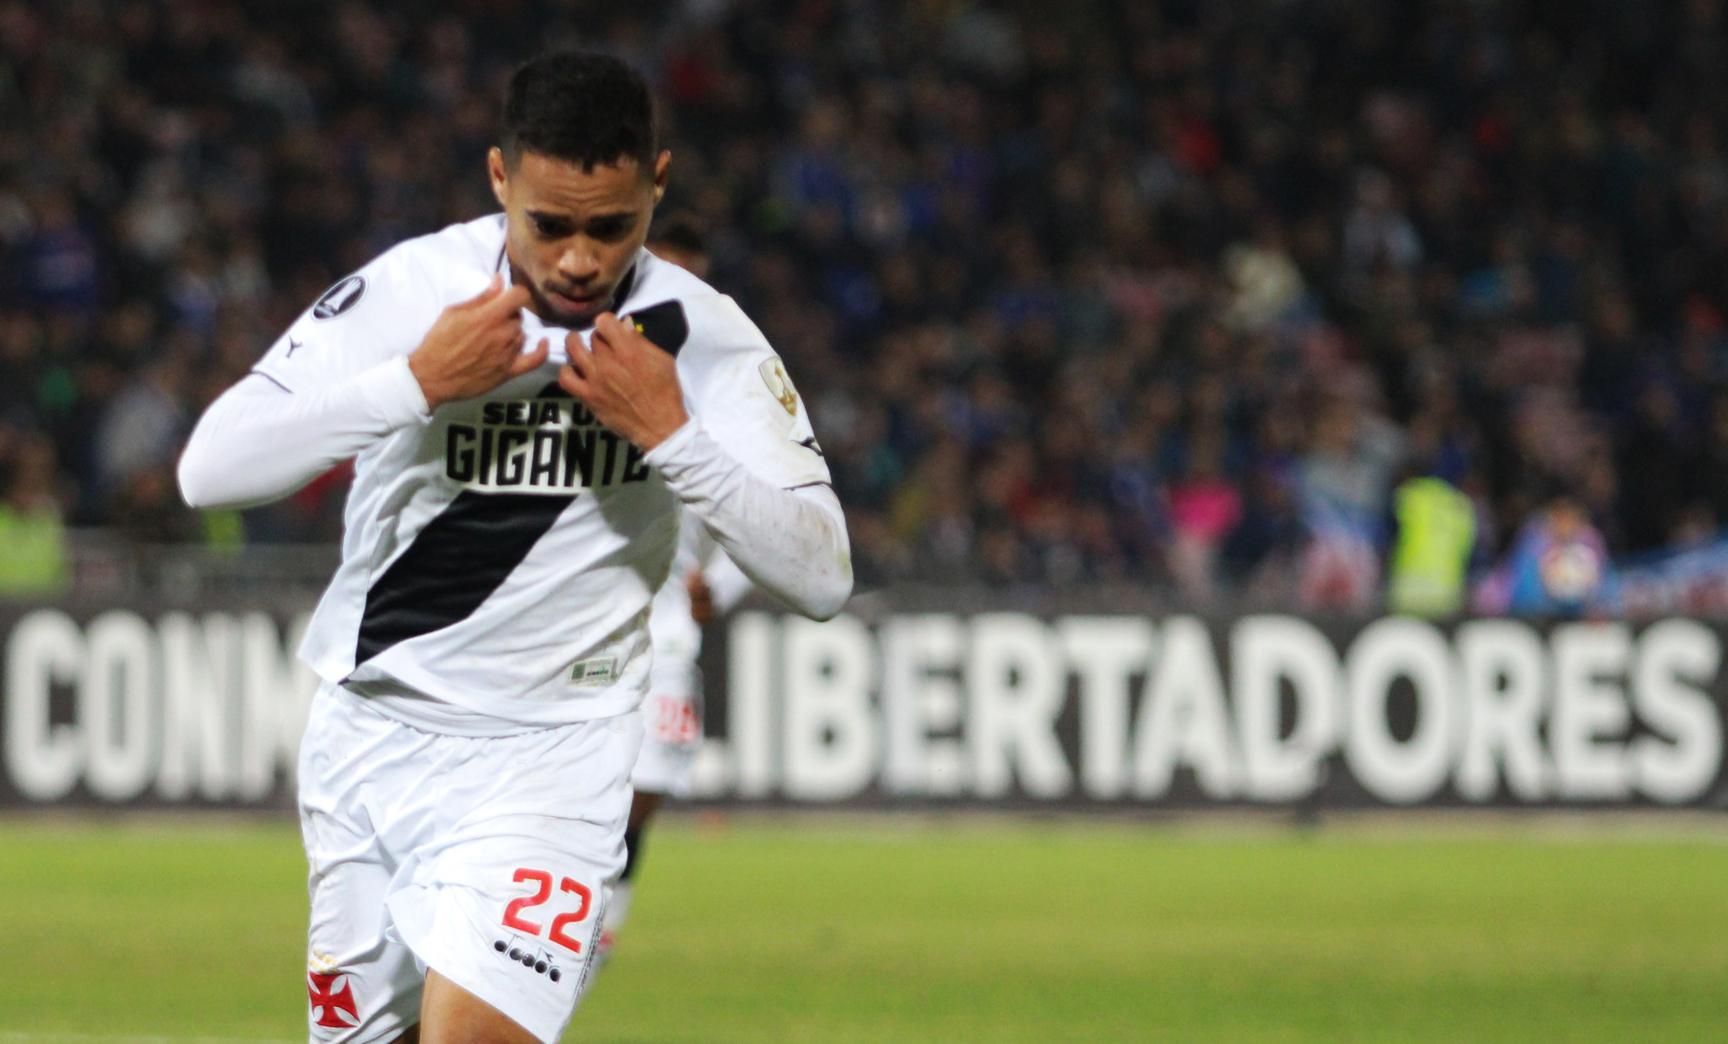 Camisa 22 logo após marcar seu quarto gol na Libertadores 7212d372a960e